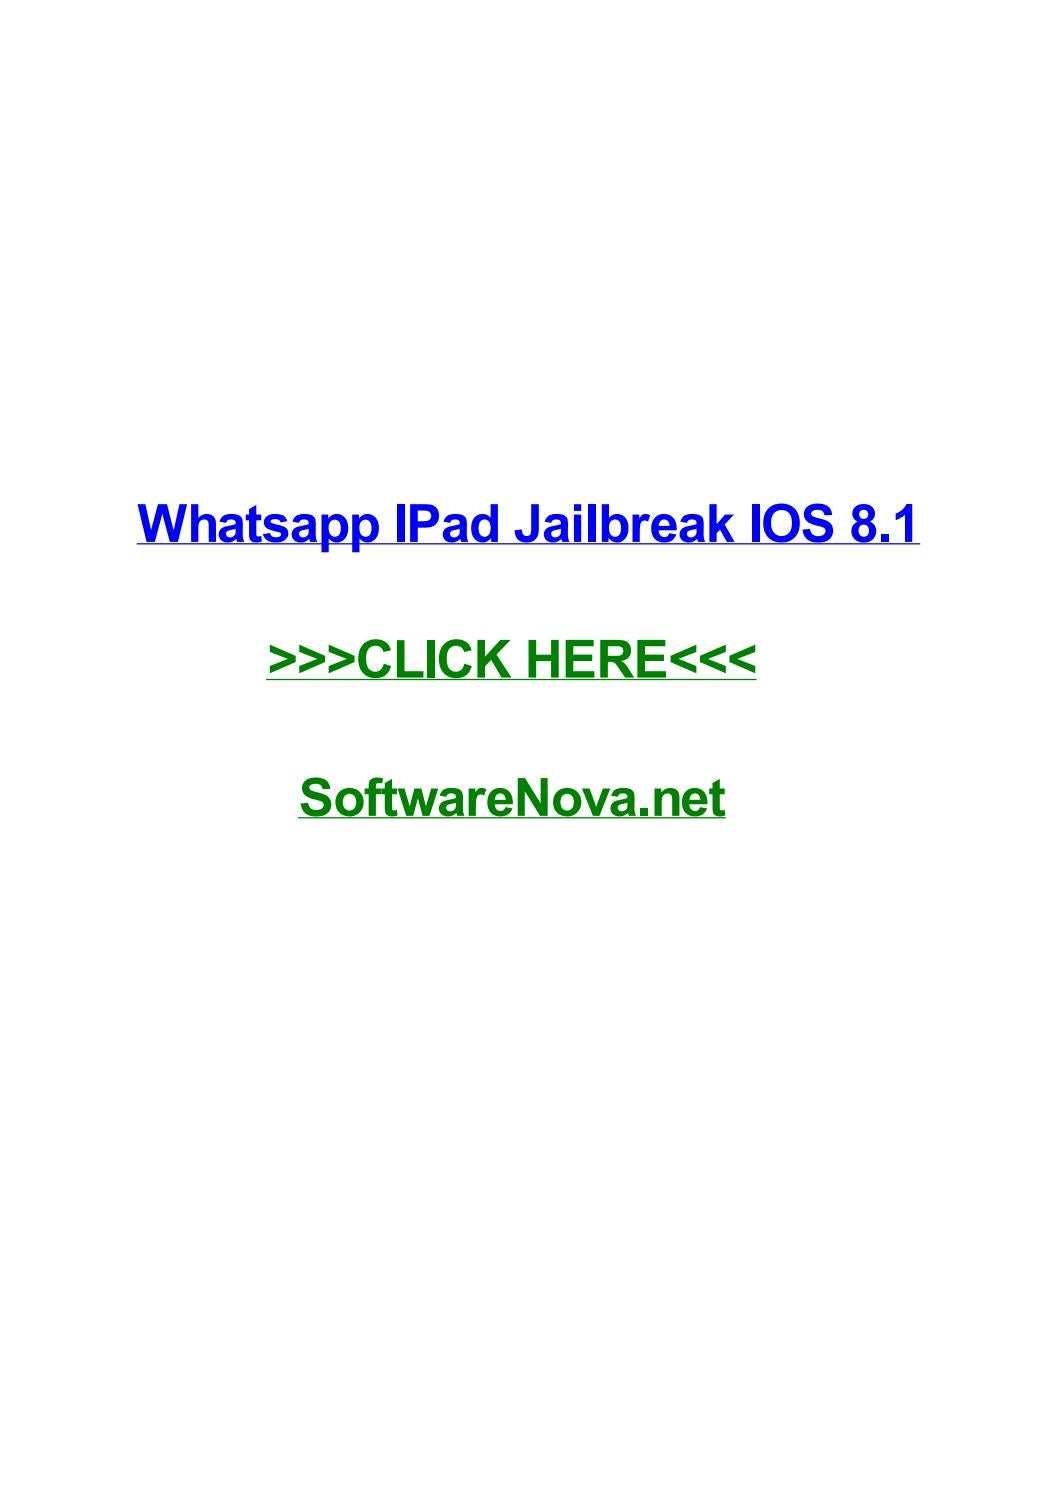 Whatsapp ipad jailbreak ios 8 1 by sandracvhwa - issuu